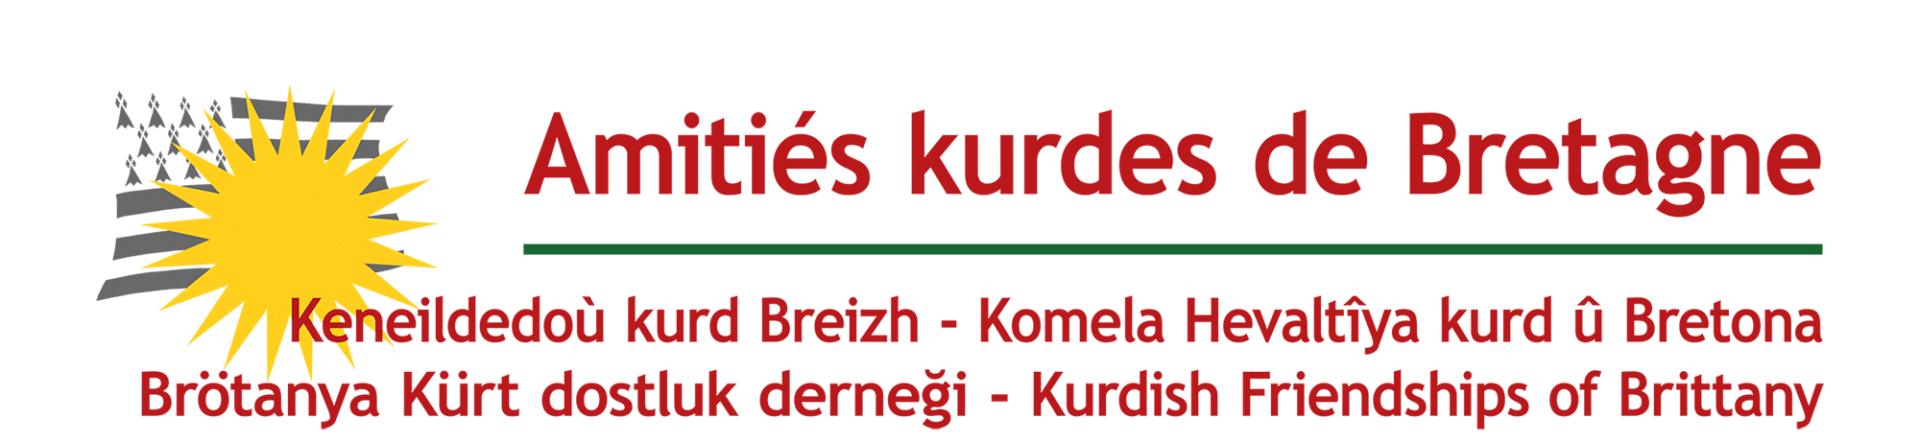 Keneildedoù kurd Breizh